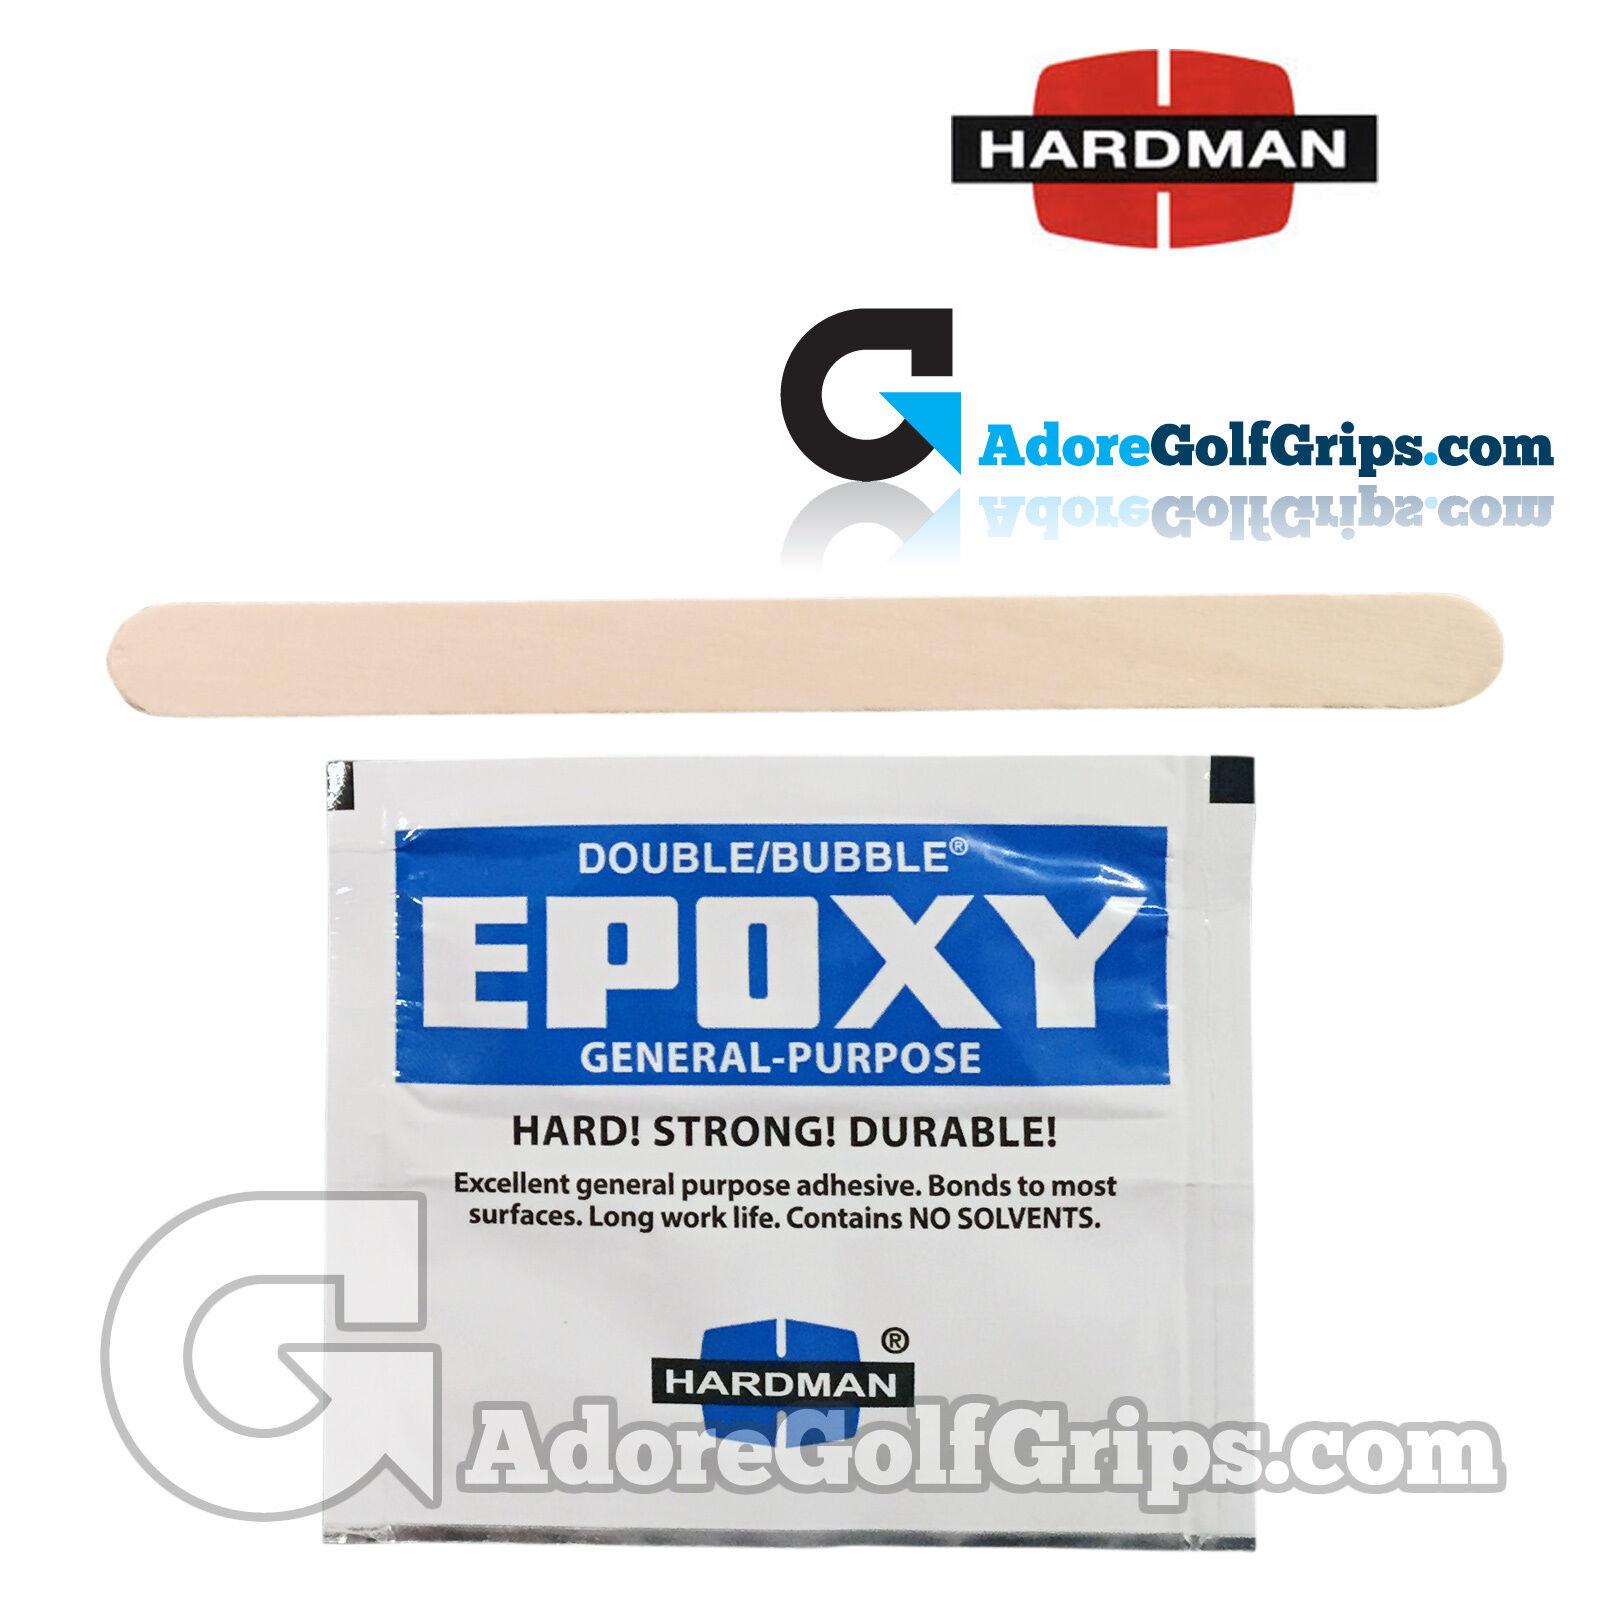 04023 Hardman Double Bubble Urethane Blue//Beige-Label D85 High Shear Packets